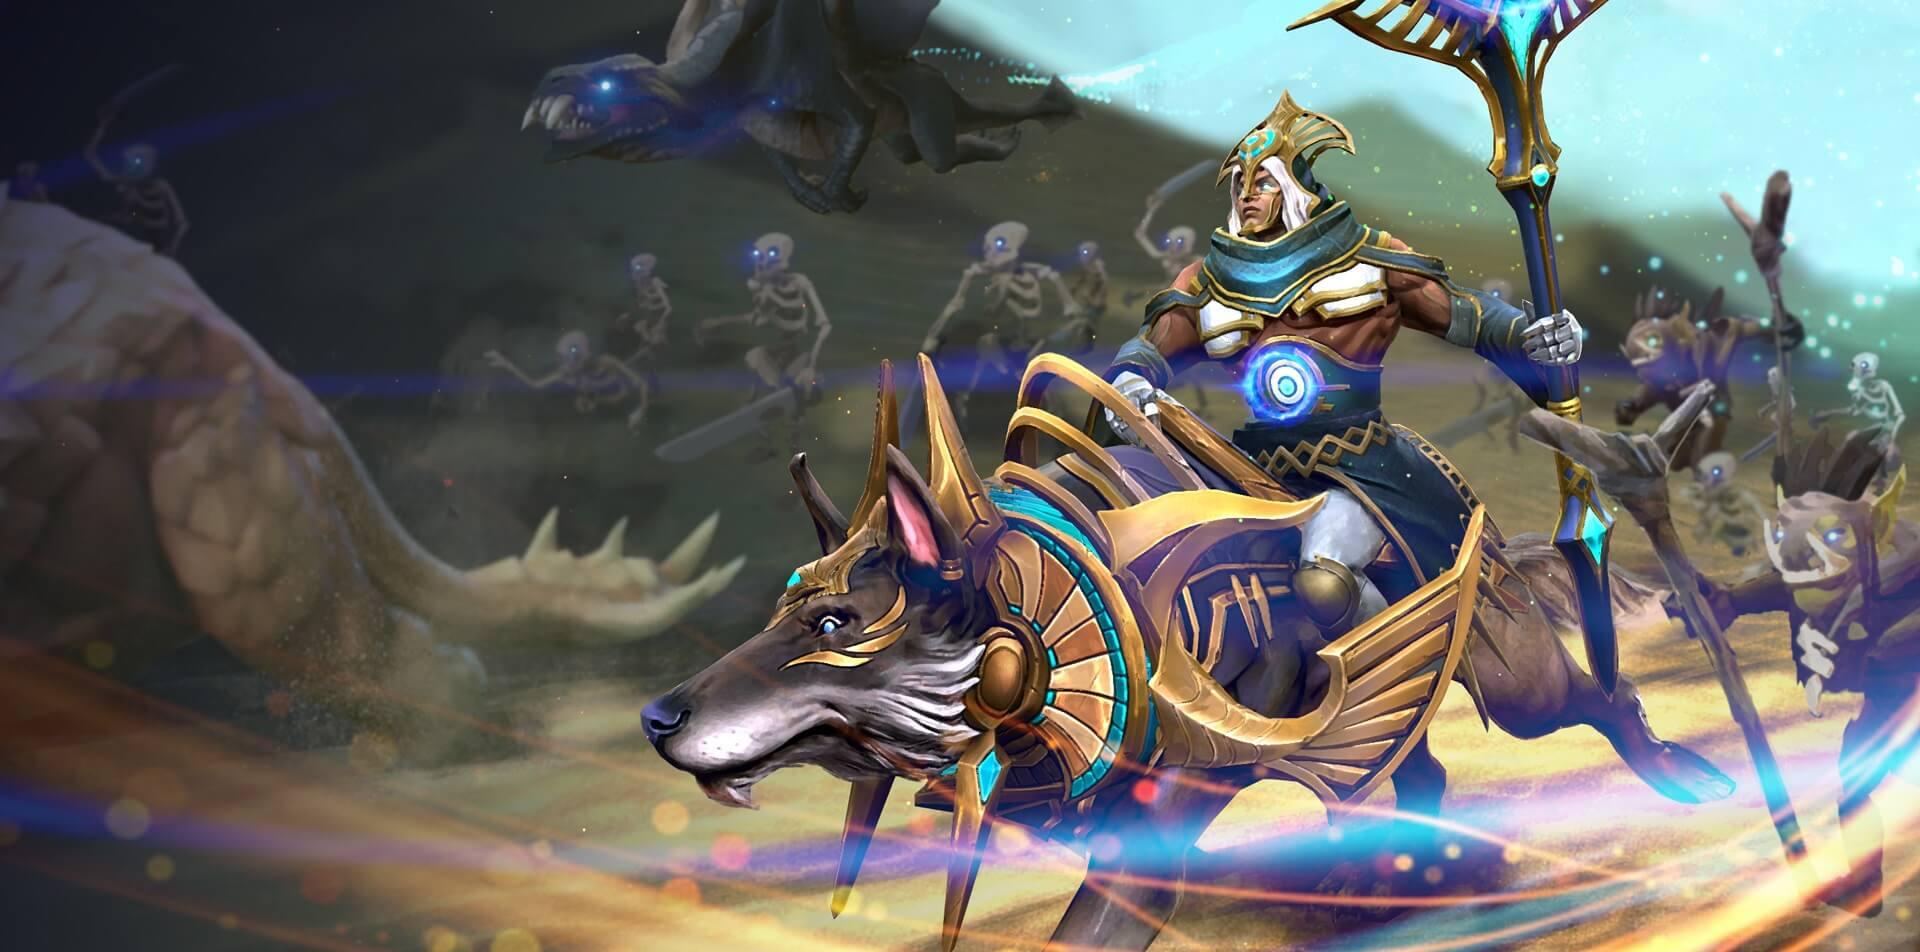 Prospect of the Progenitor's Gaze loading screen for Chen - Valve